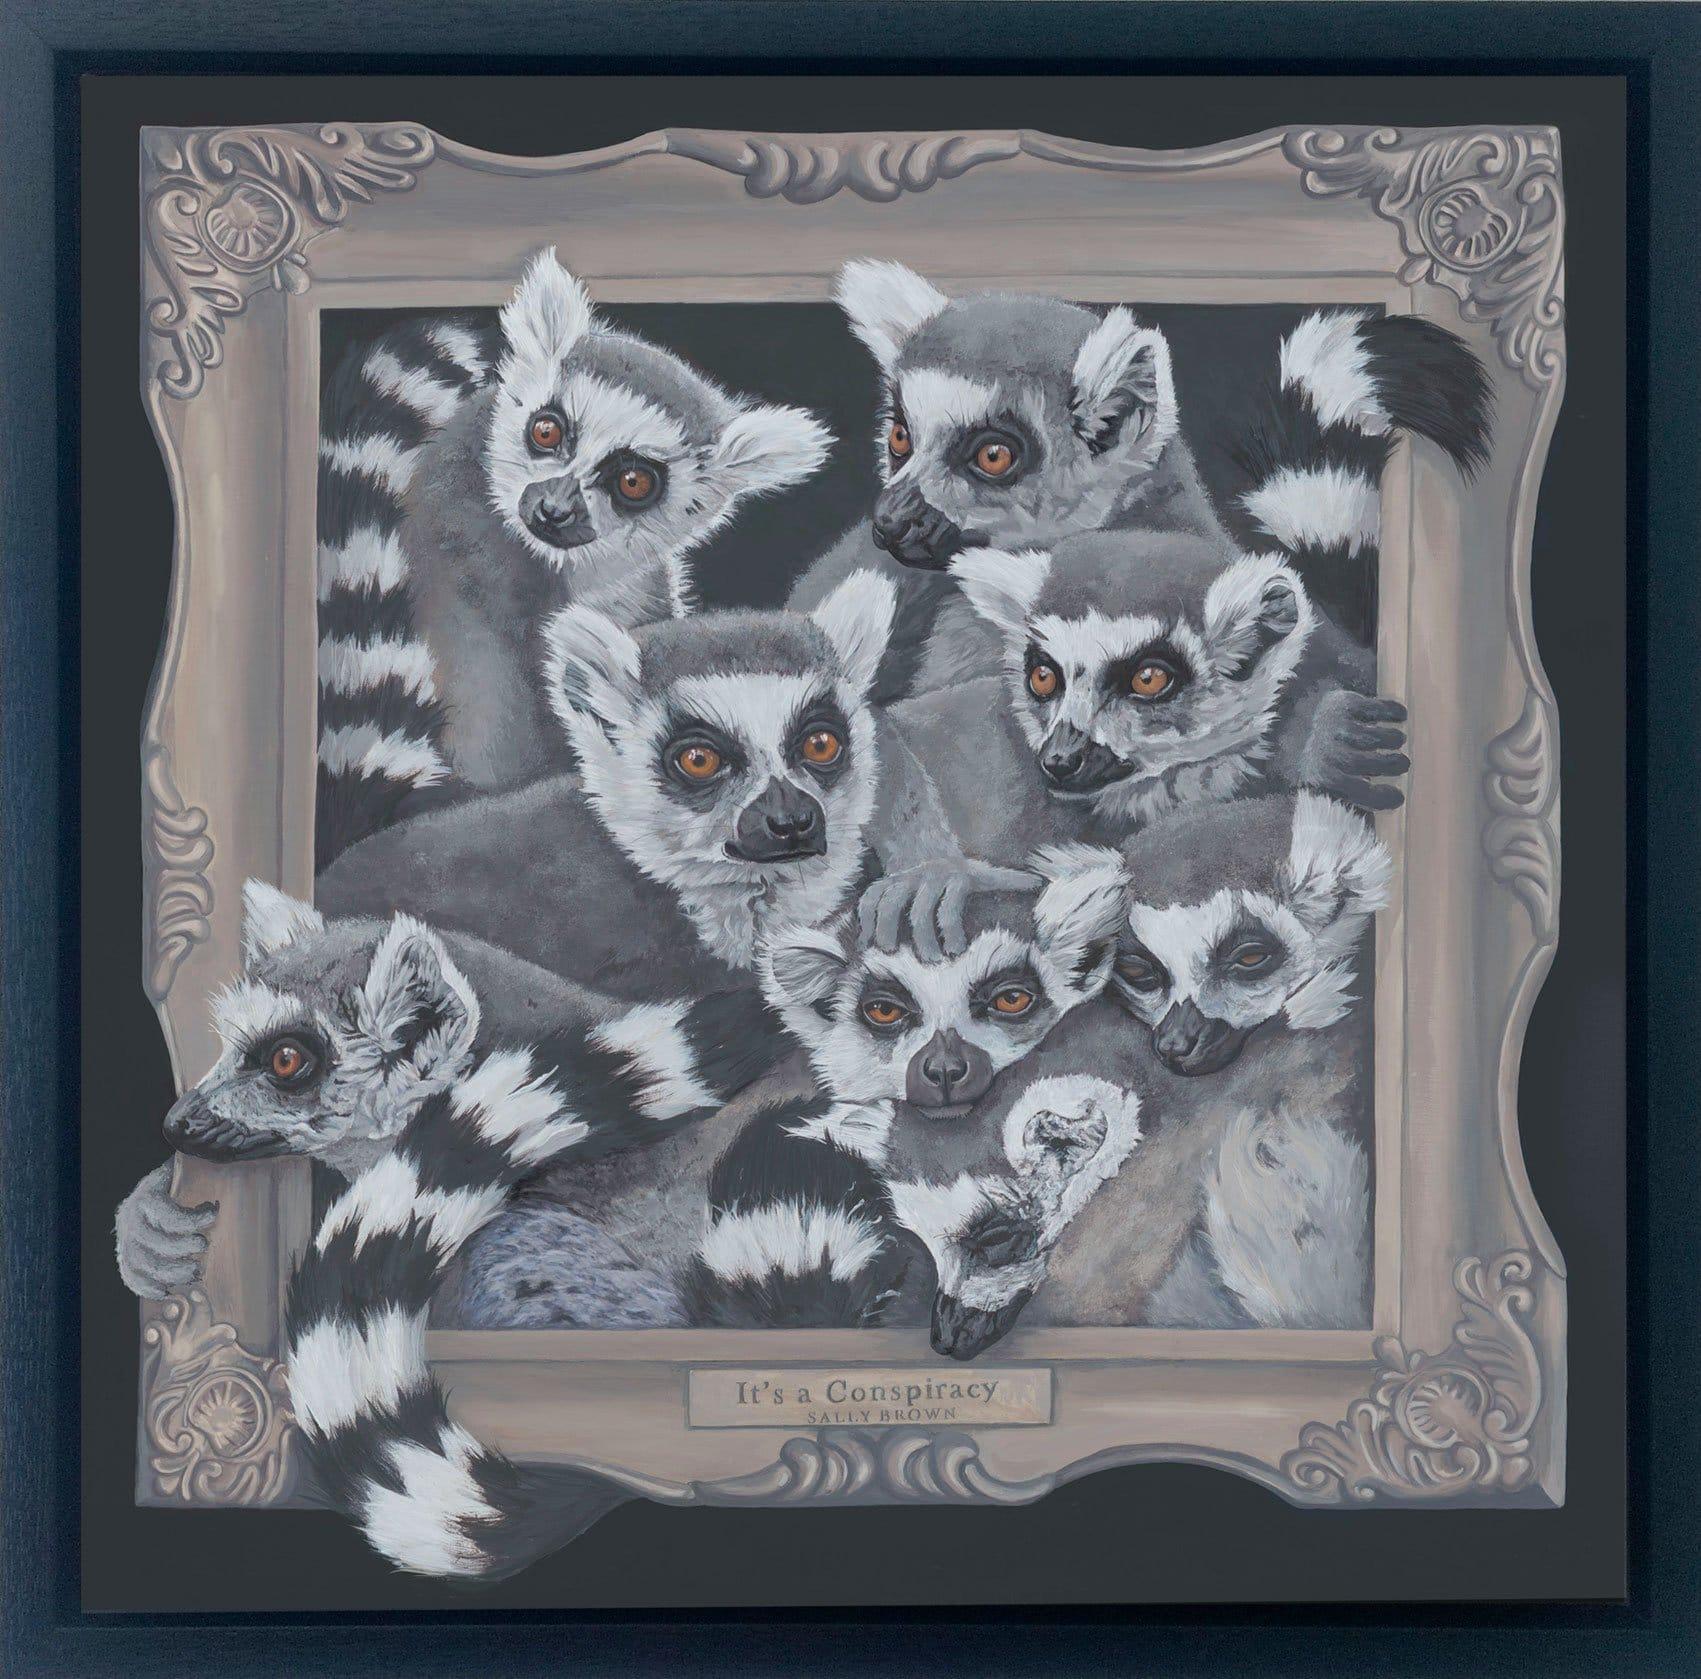 Framed-canvas-It'saconspiracy